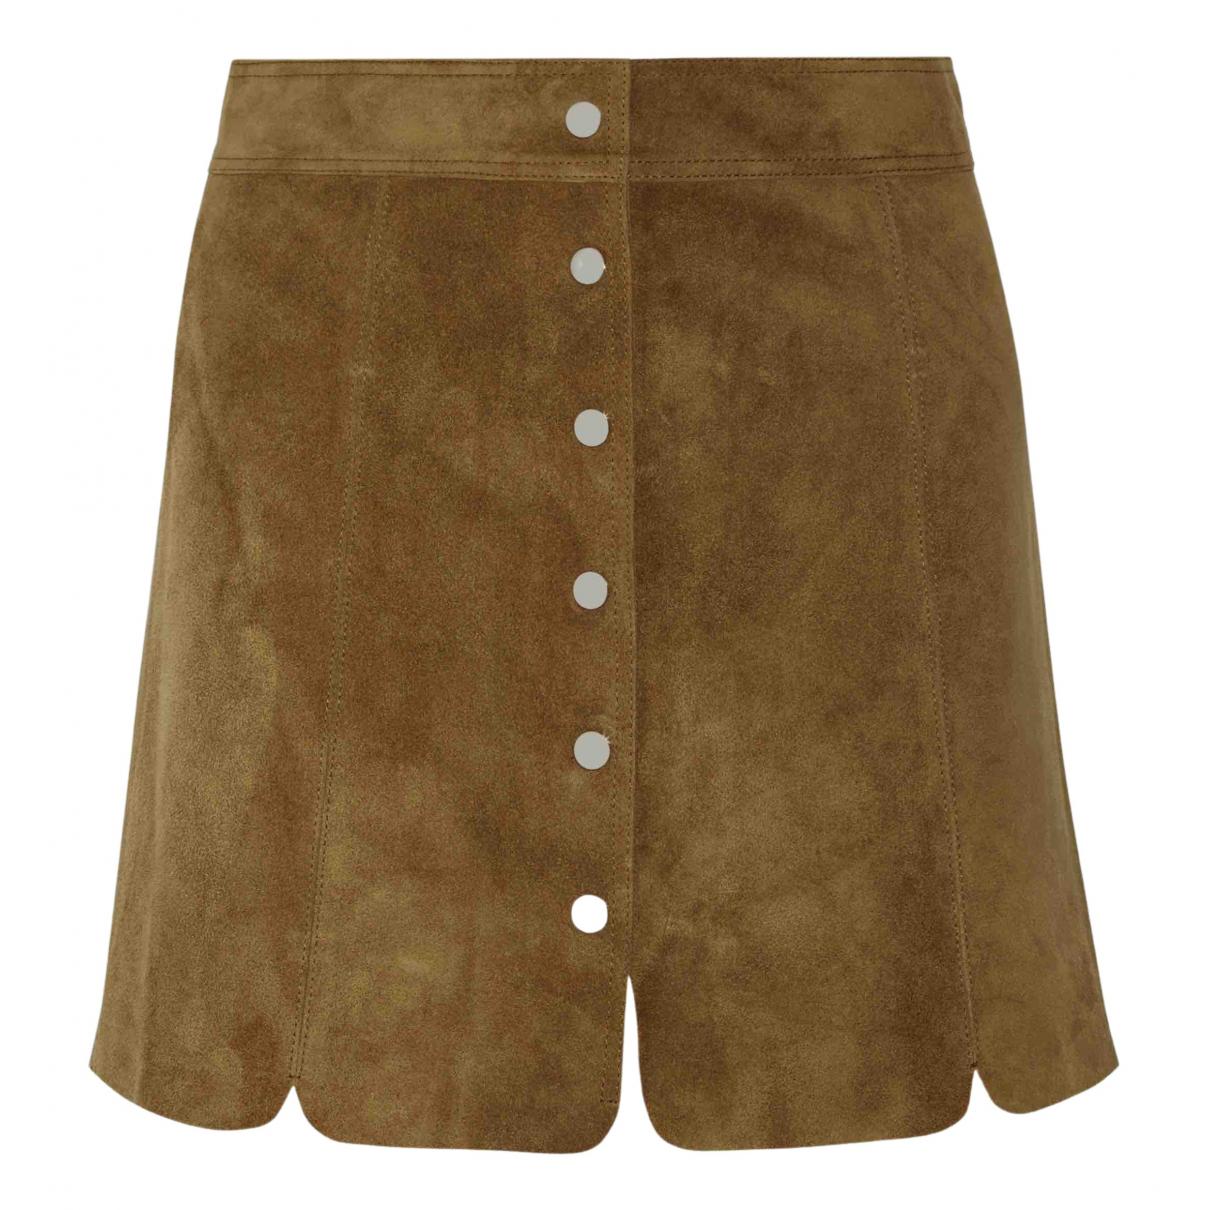 Isabel Marant Etoile \N Camel Suede skirt for Women 40 FR